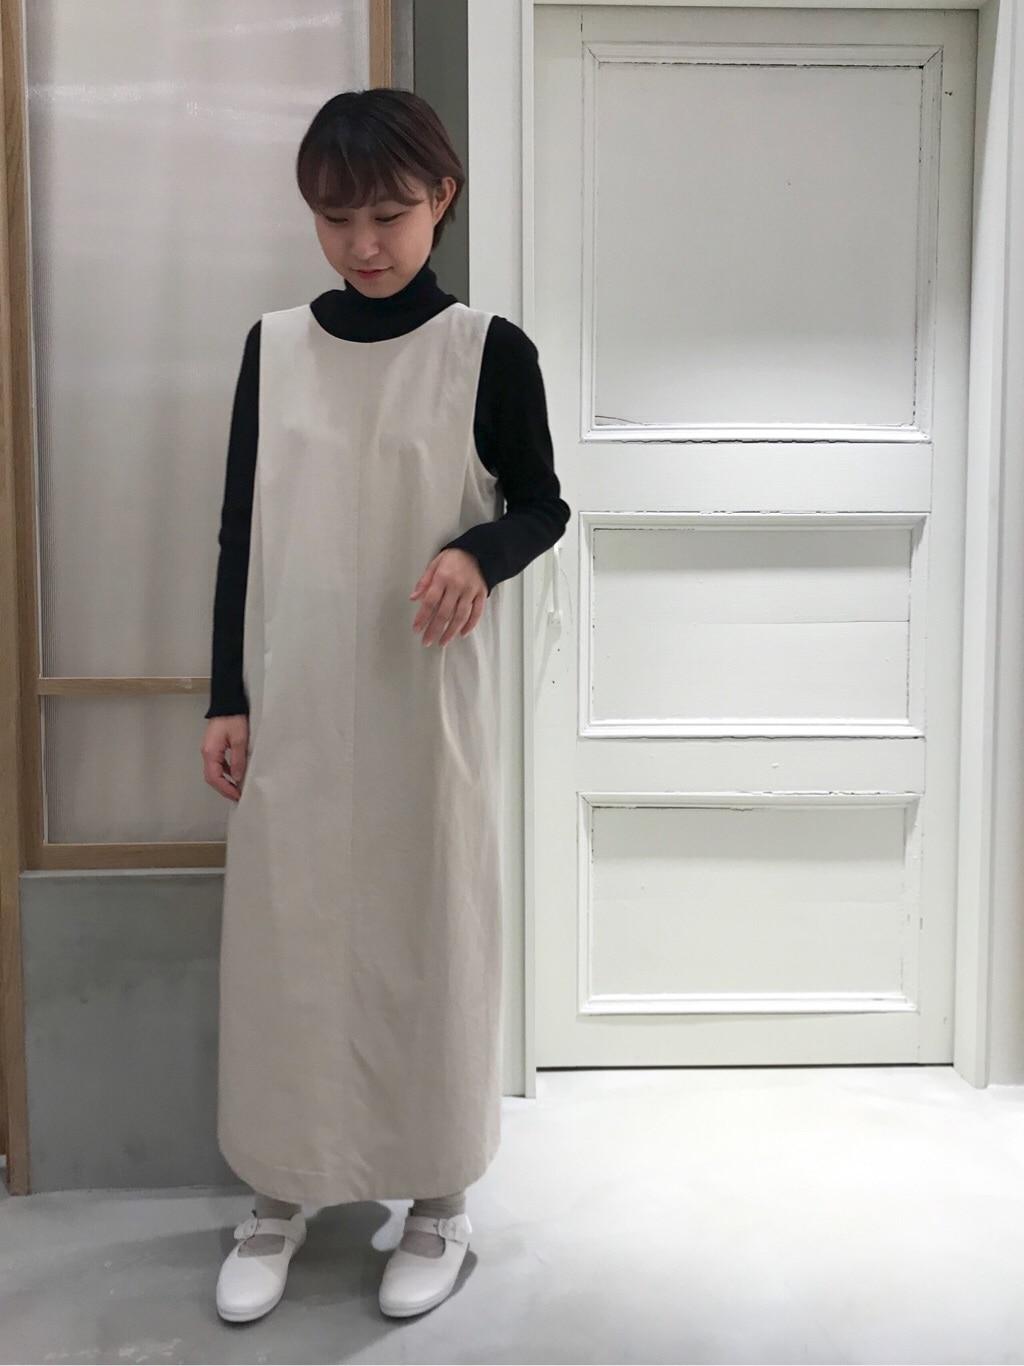 bulle de savon 渋谷スクランブルスクエア 身長:159cm 2020.01.08